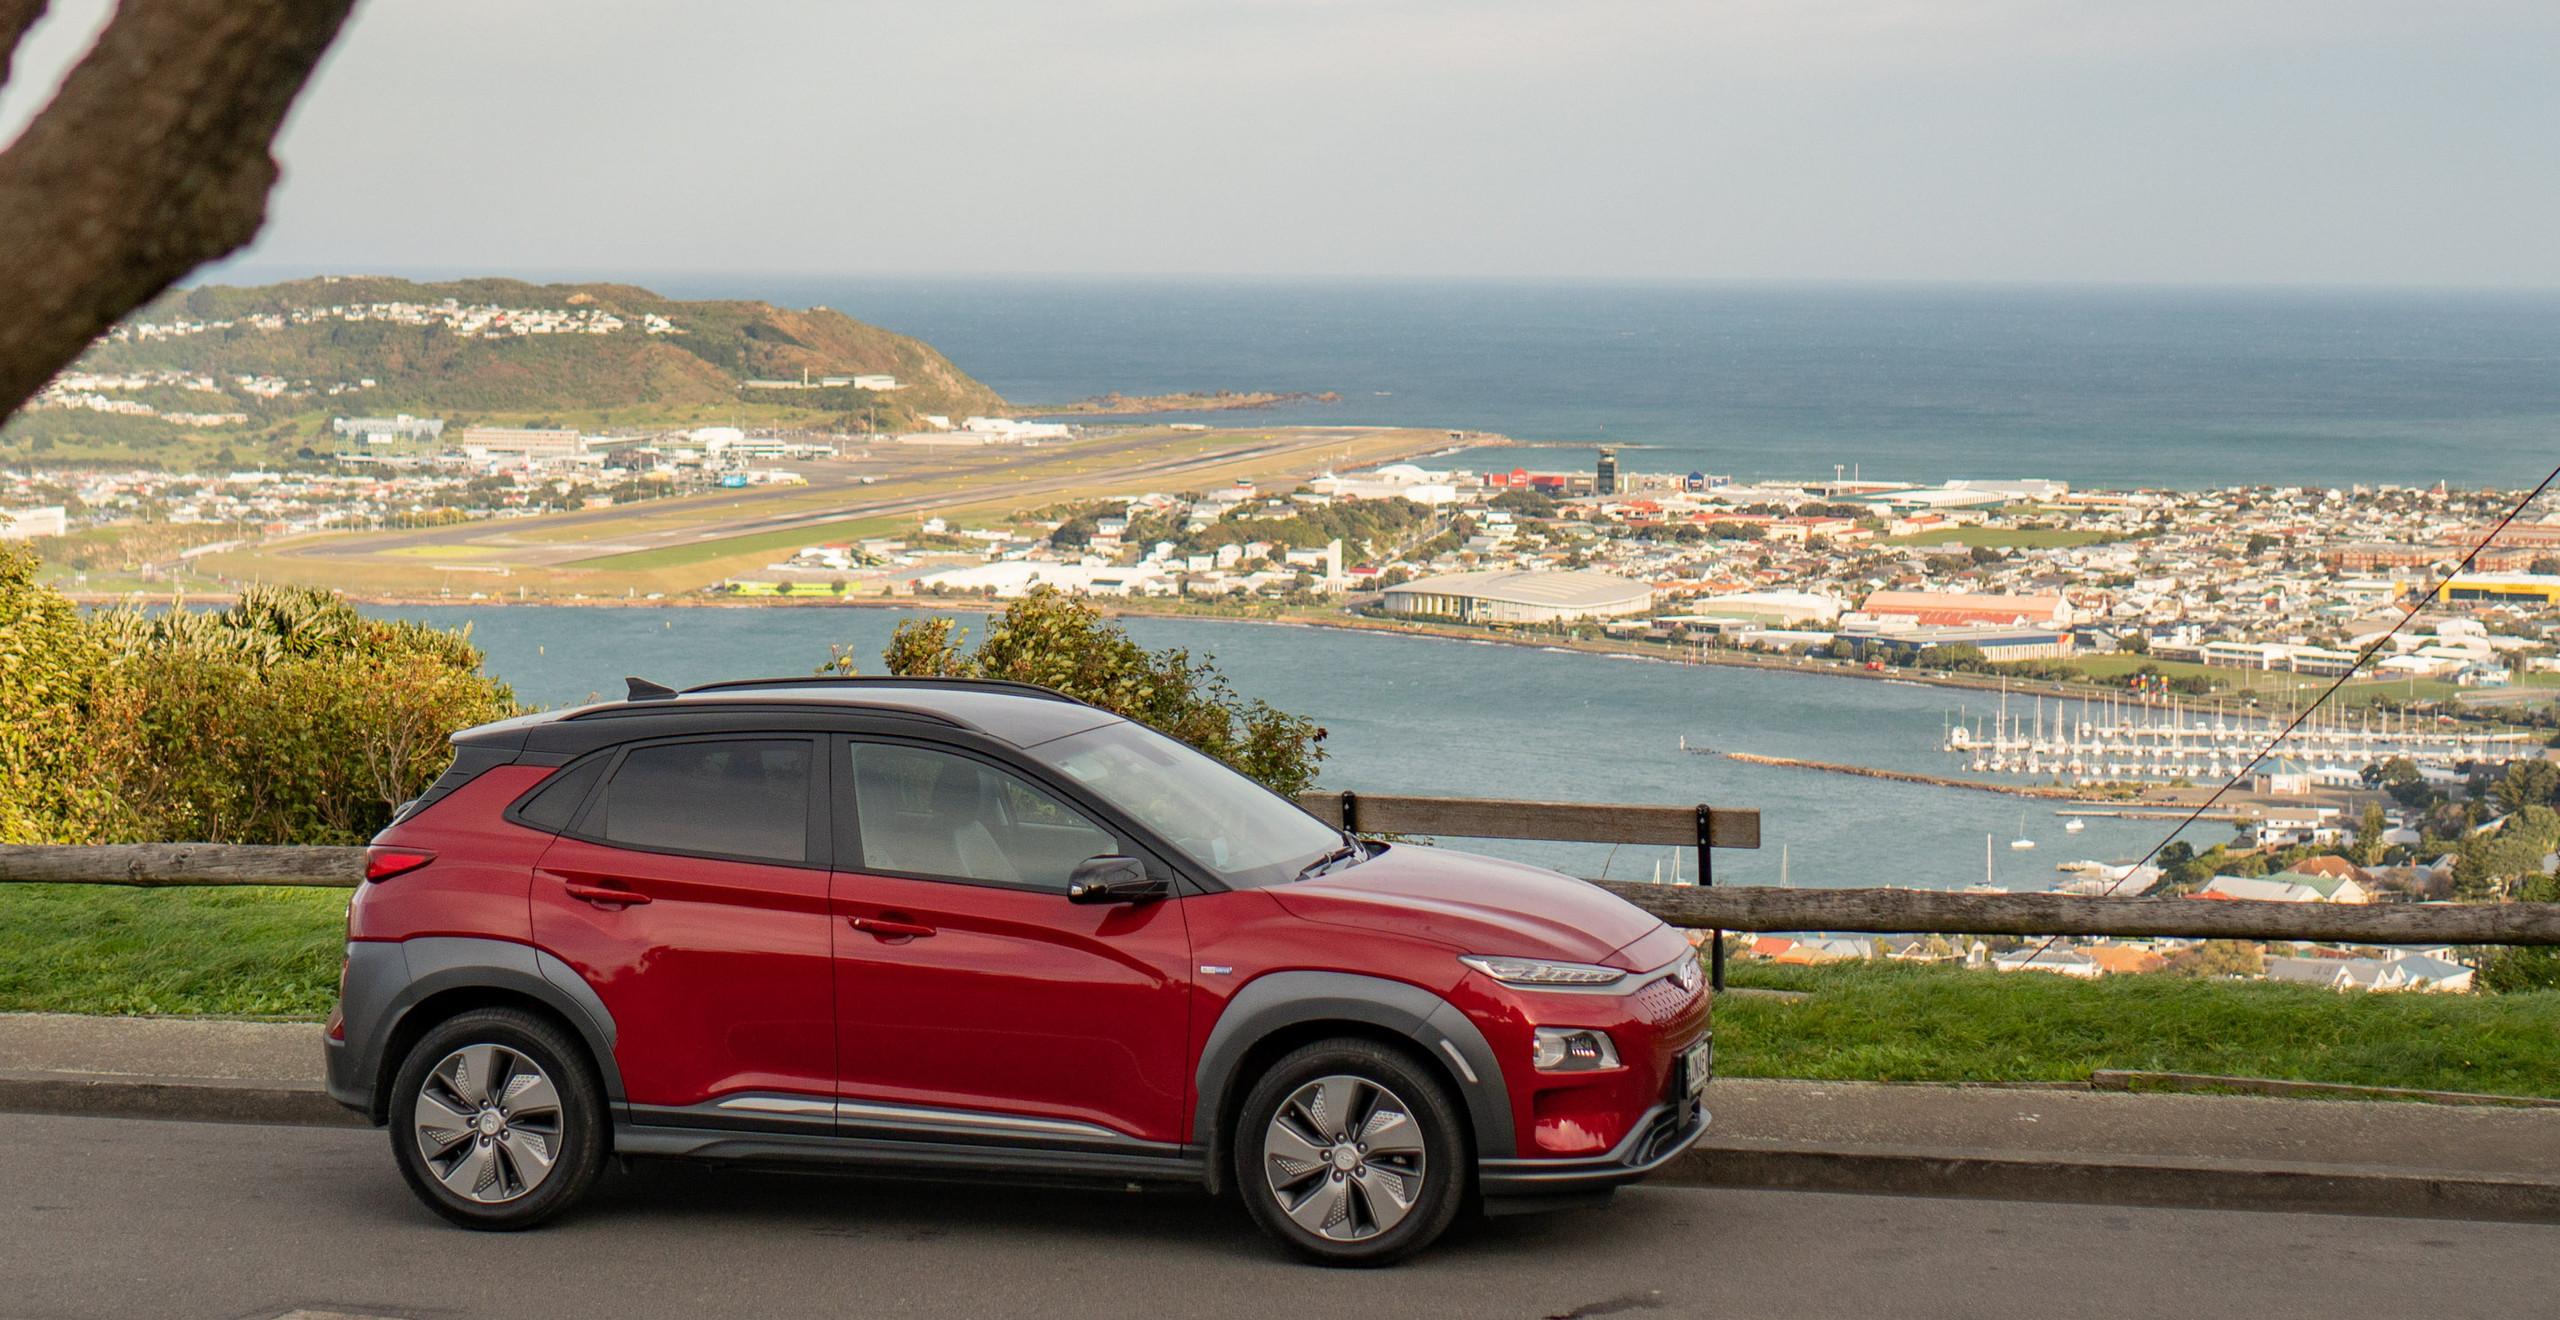 Hyundai Kona Electric 2019 front exterior red Wellington New Zealand skyline airport